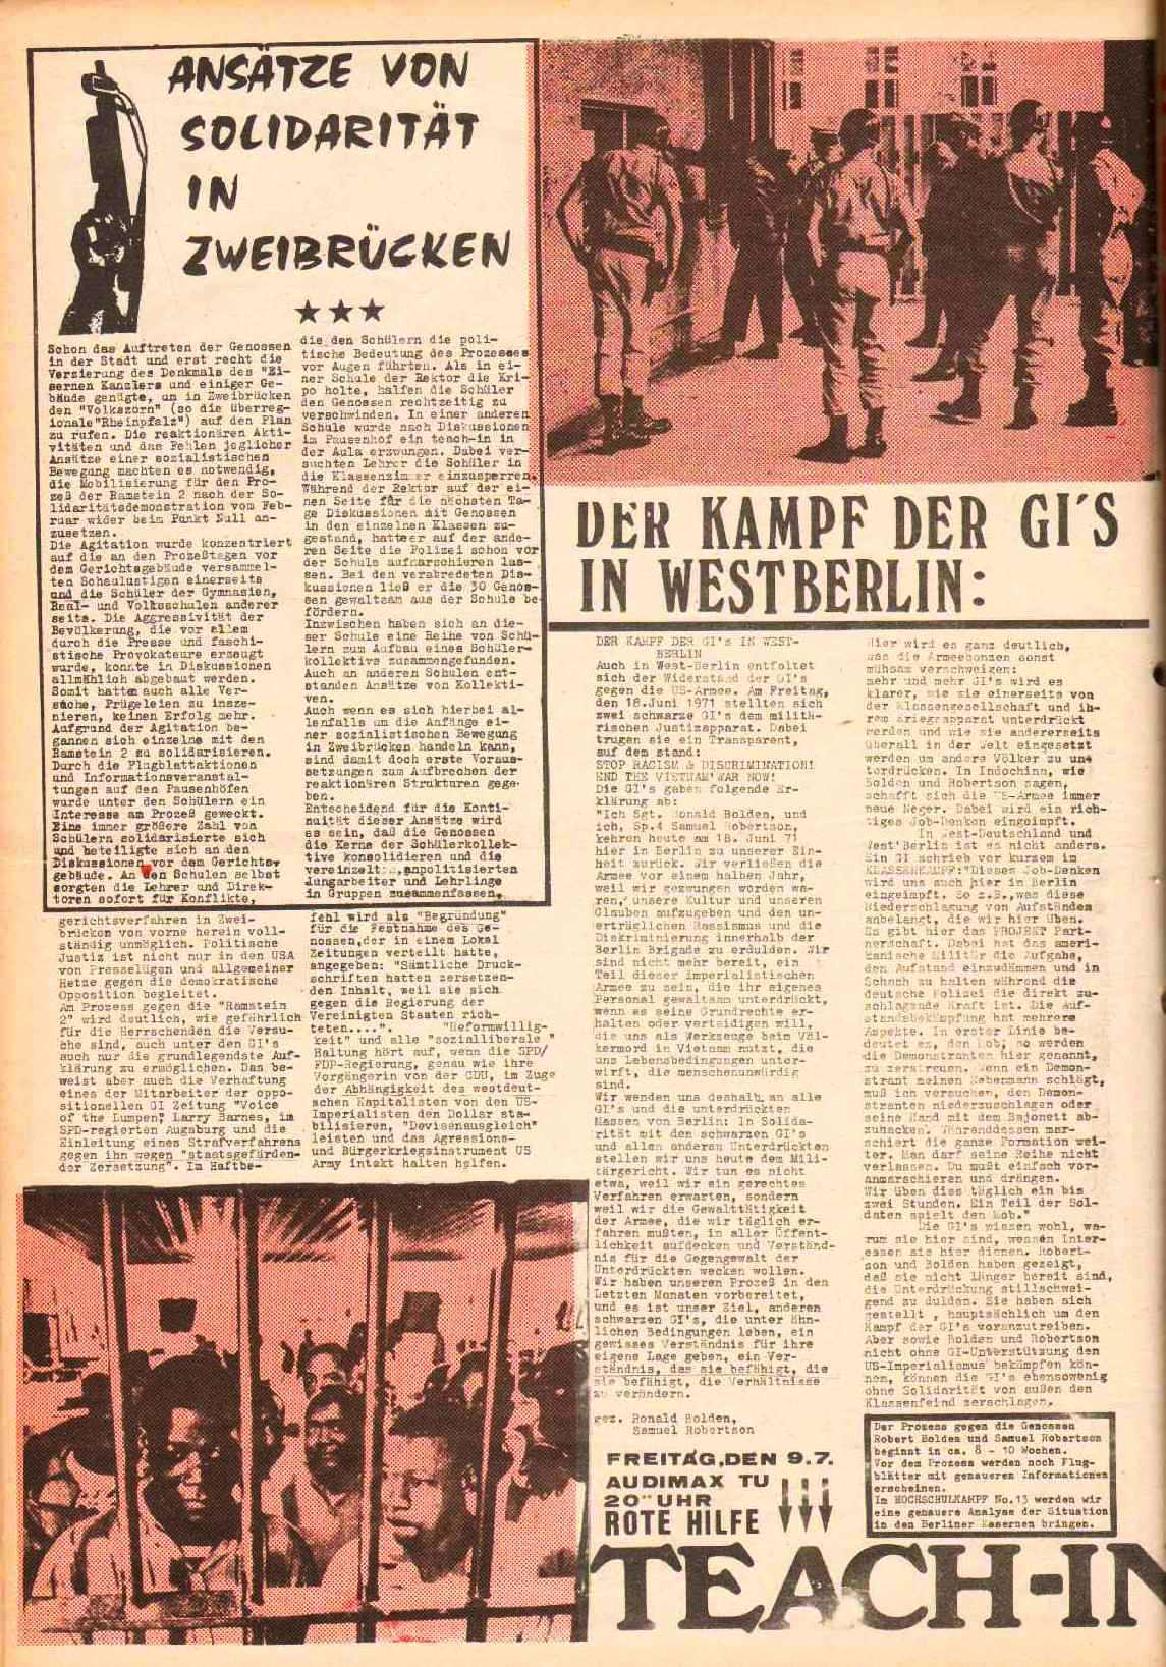 Berlin_Hochschulkampf_1971_12_12